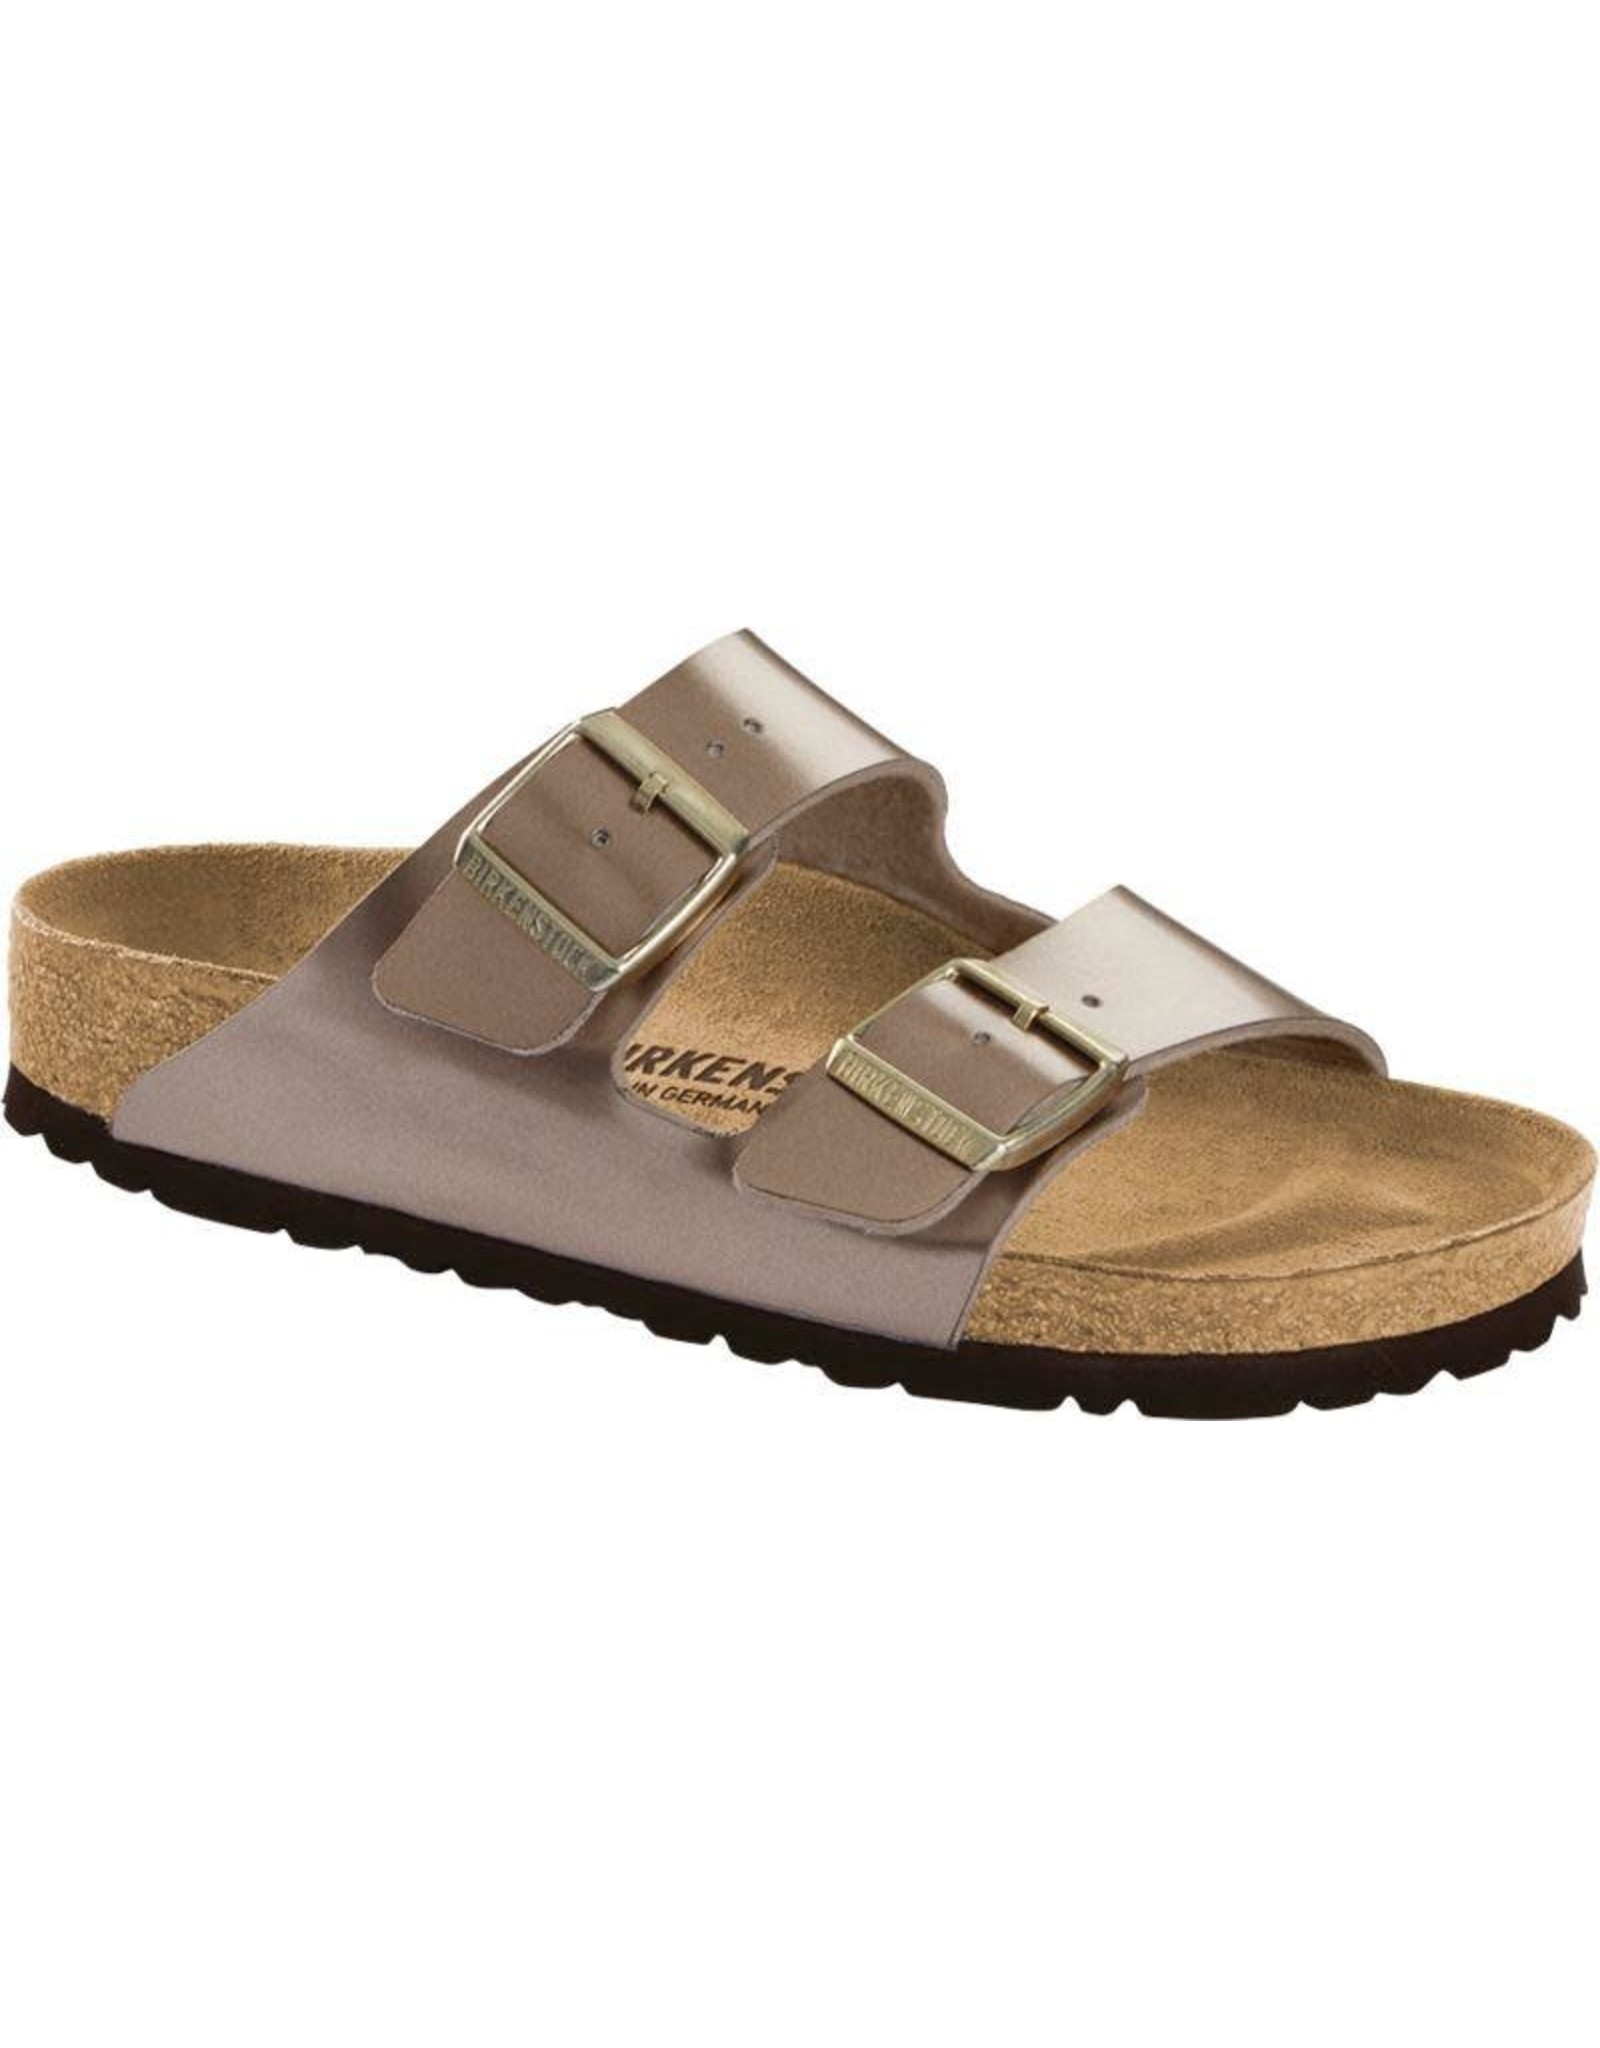 Birkenstock Arizona Electric Metallic Taupe Sandal